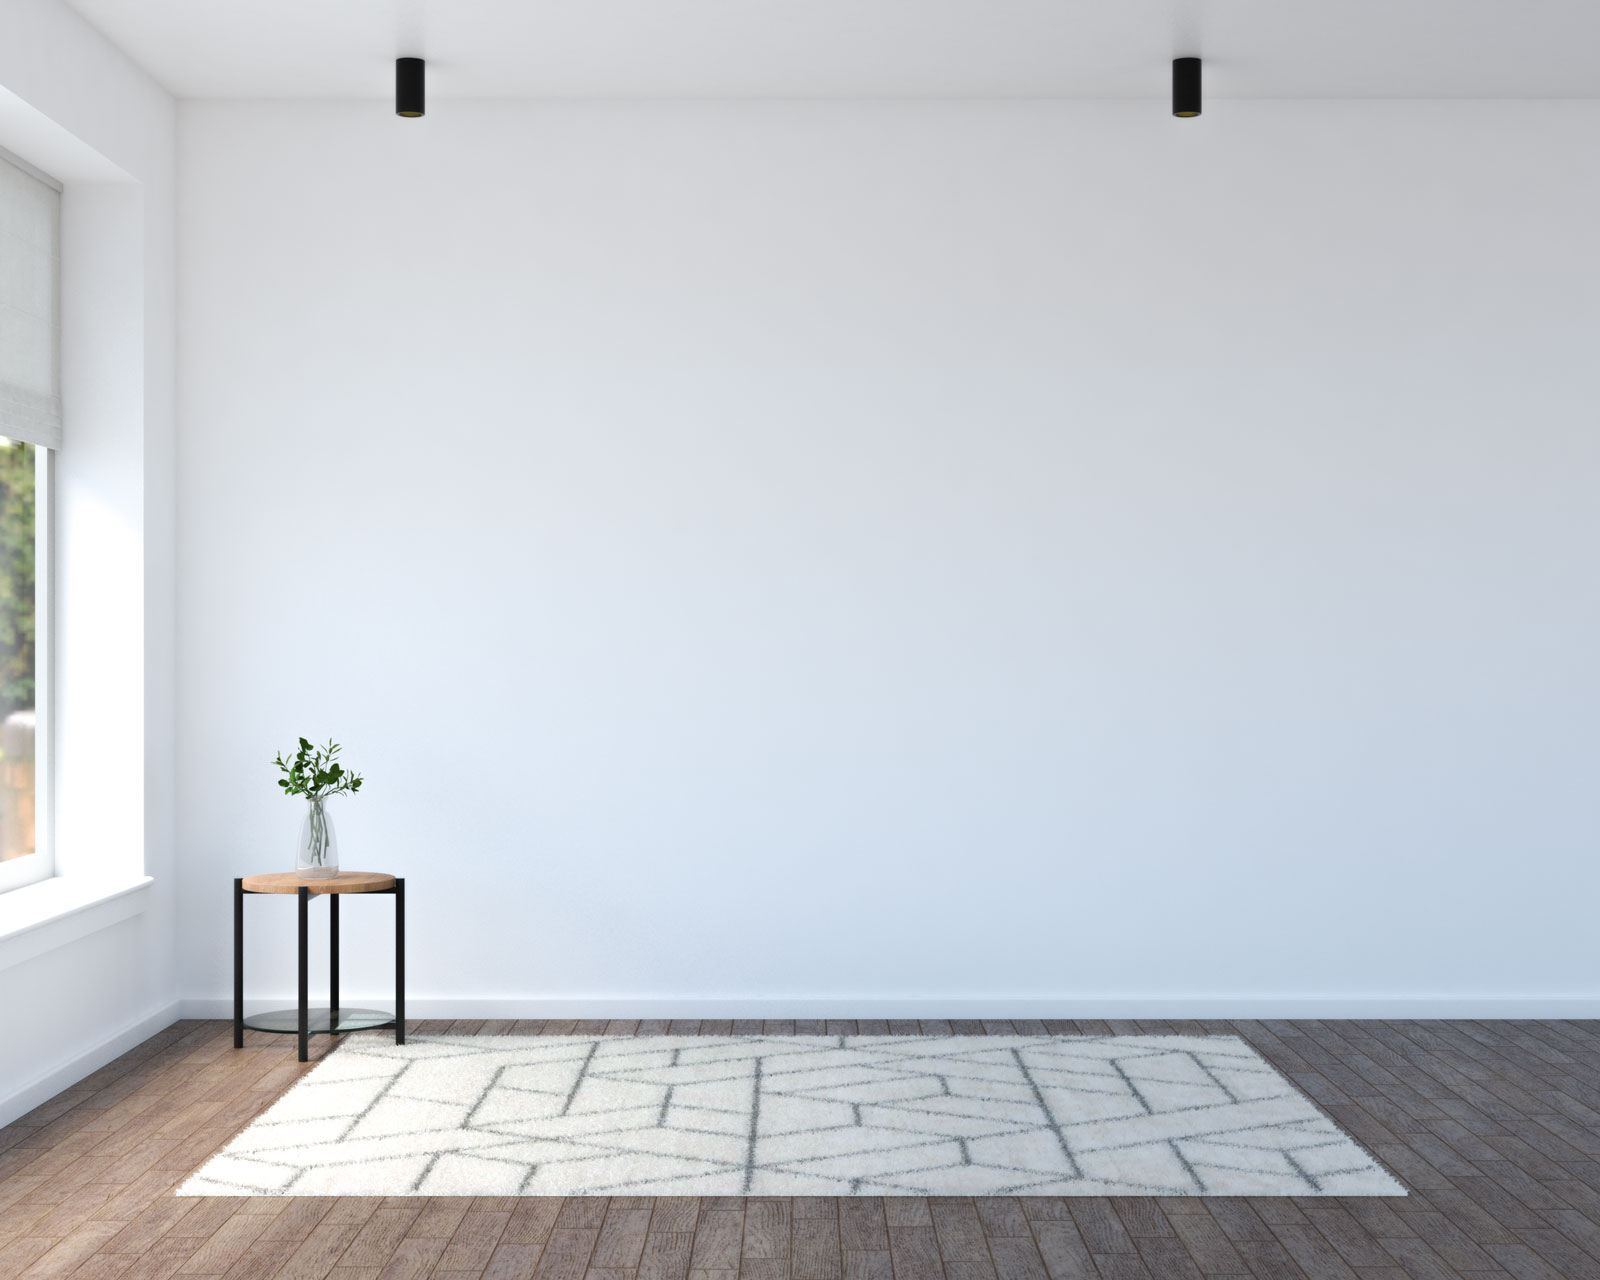 Beige geometric pattern rug